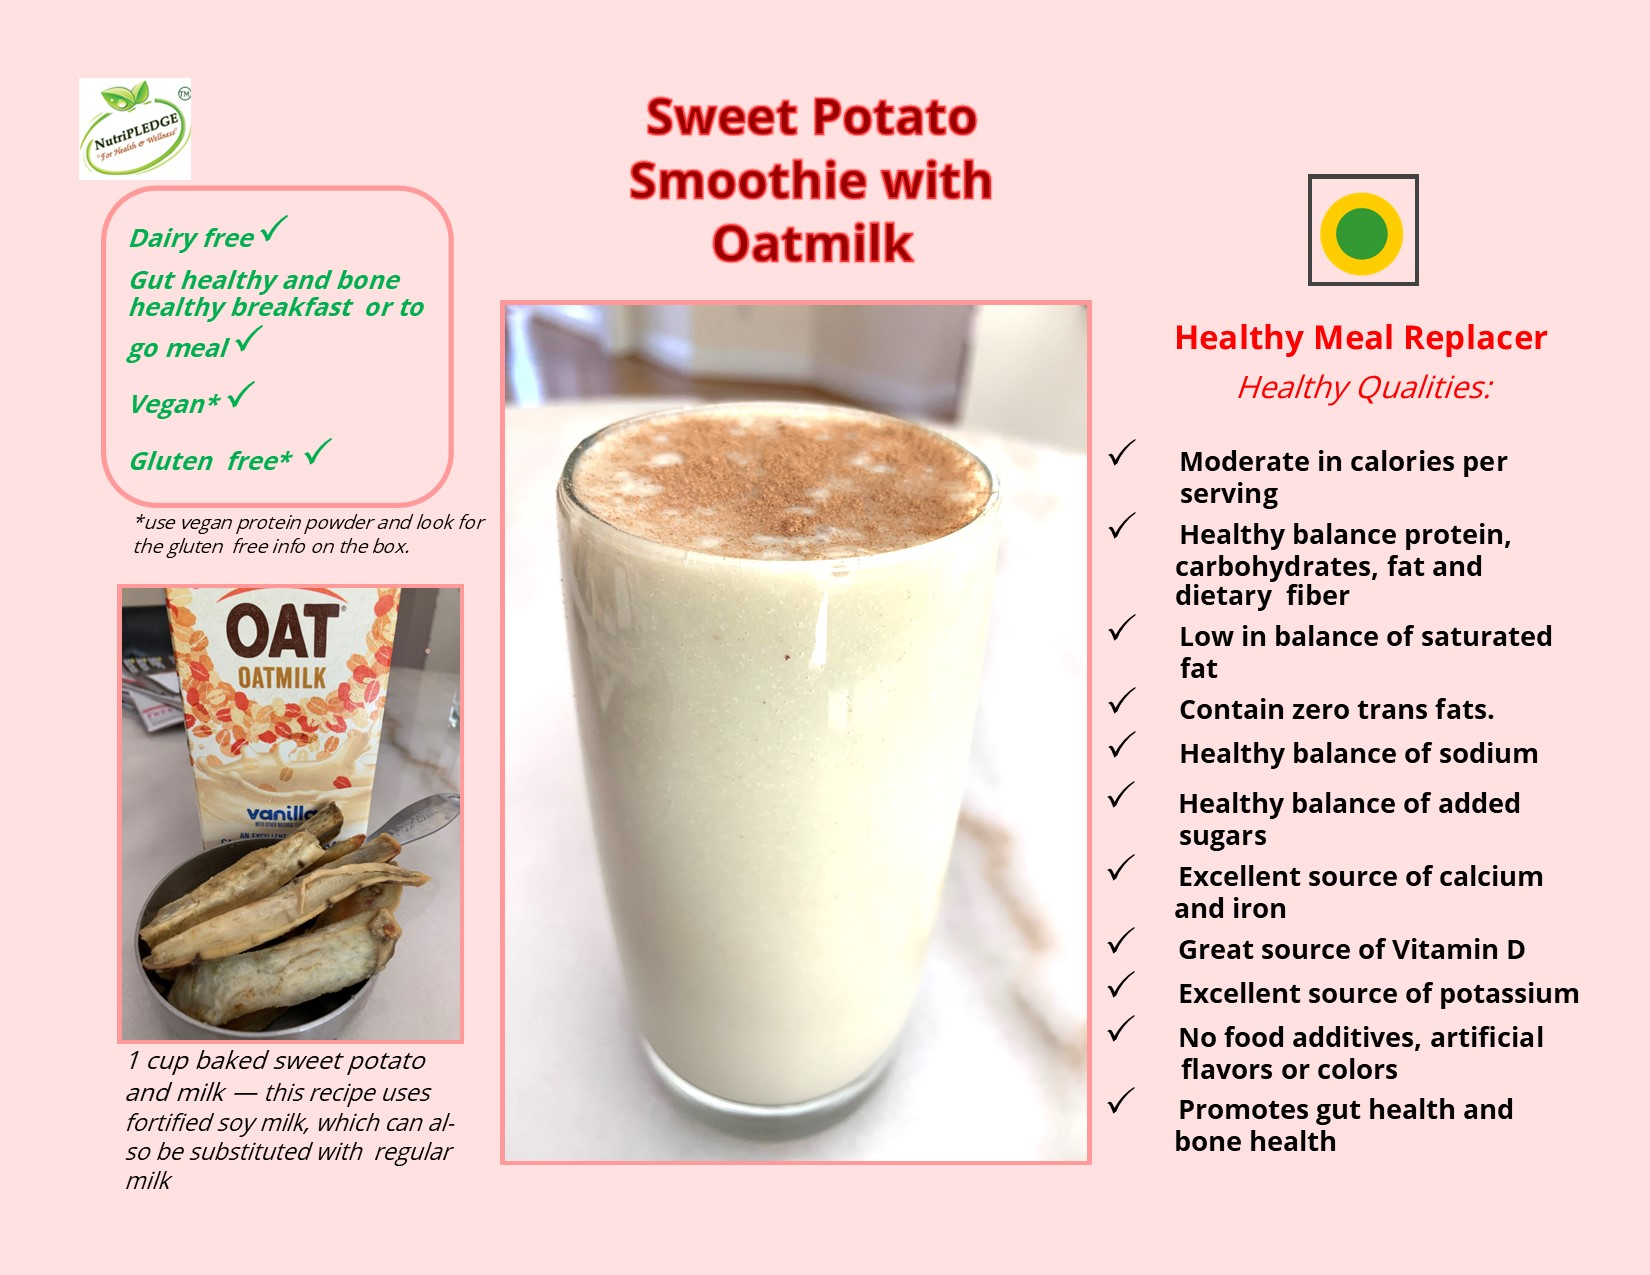 Sweet potato smoothie with oat milk